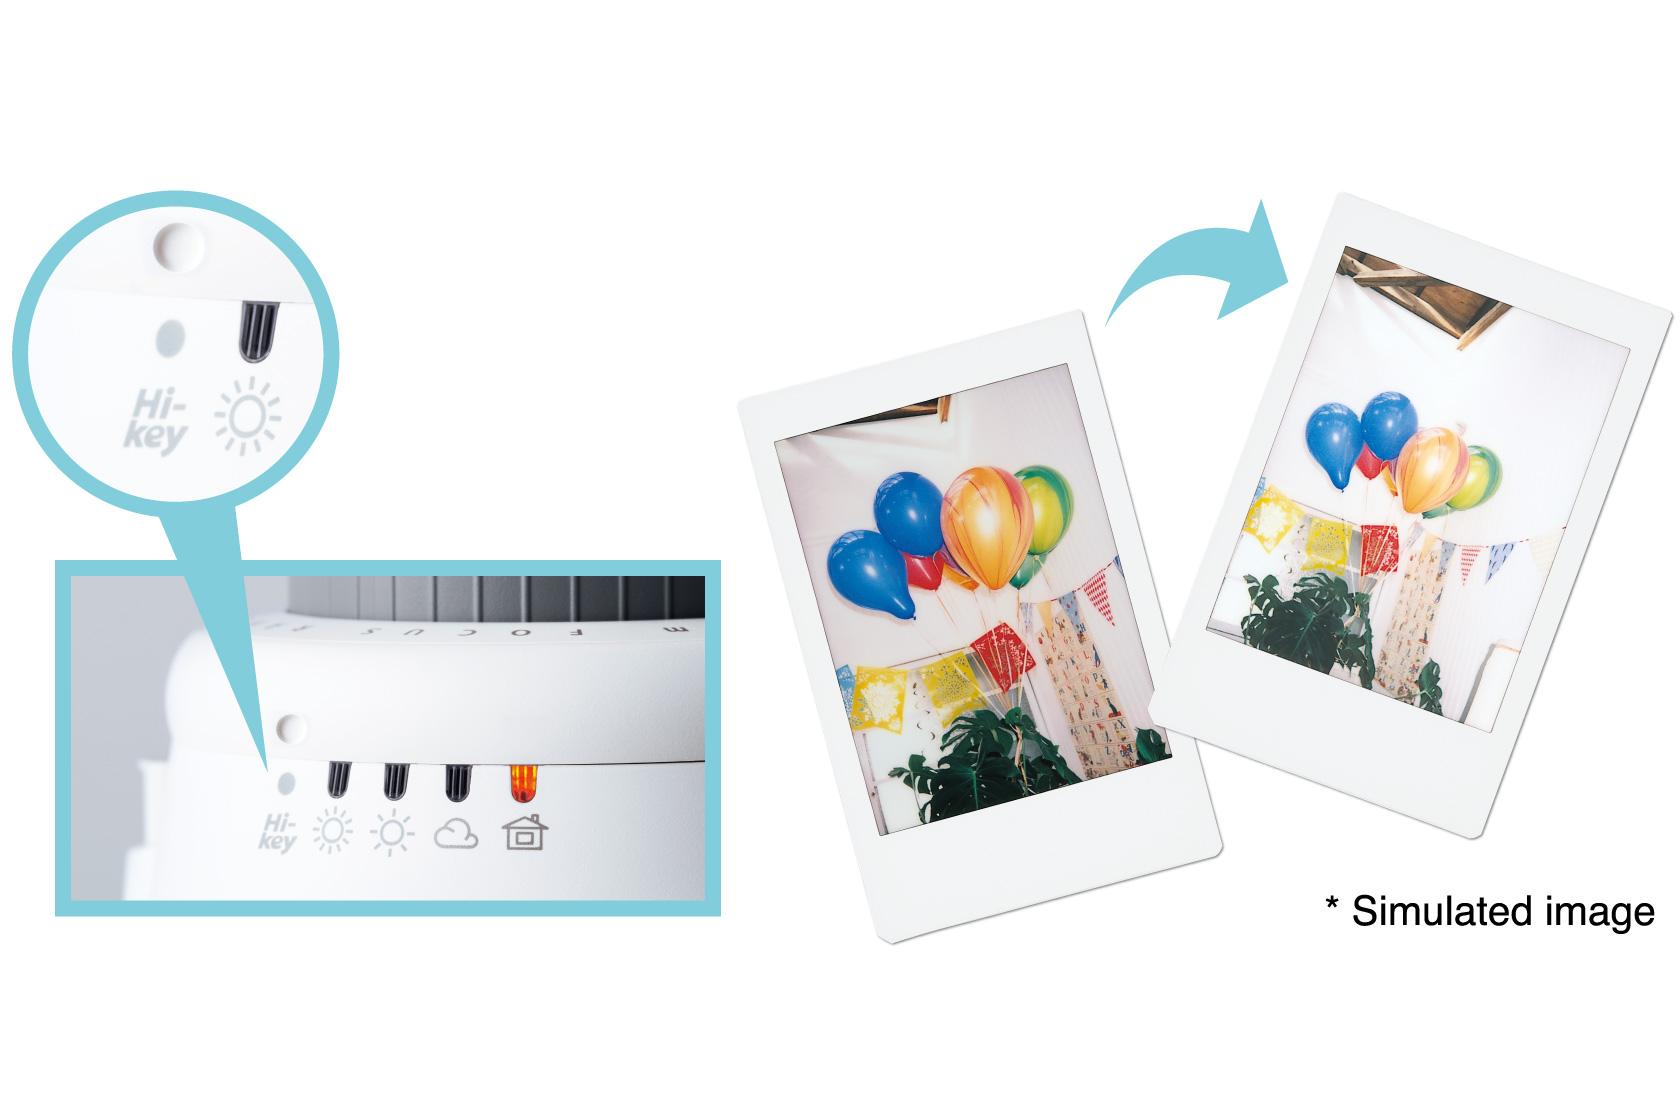 [photo] Highlight of the Instax Mini 8's Hi-Key adjustment dial and sample photos